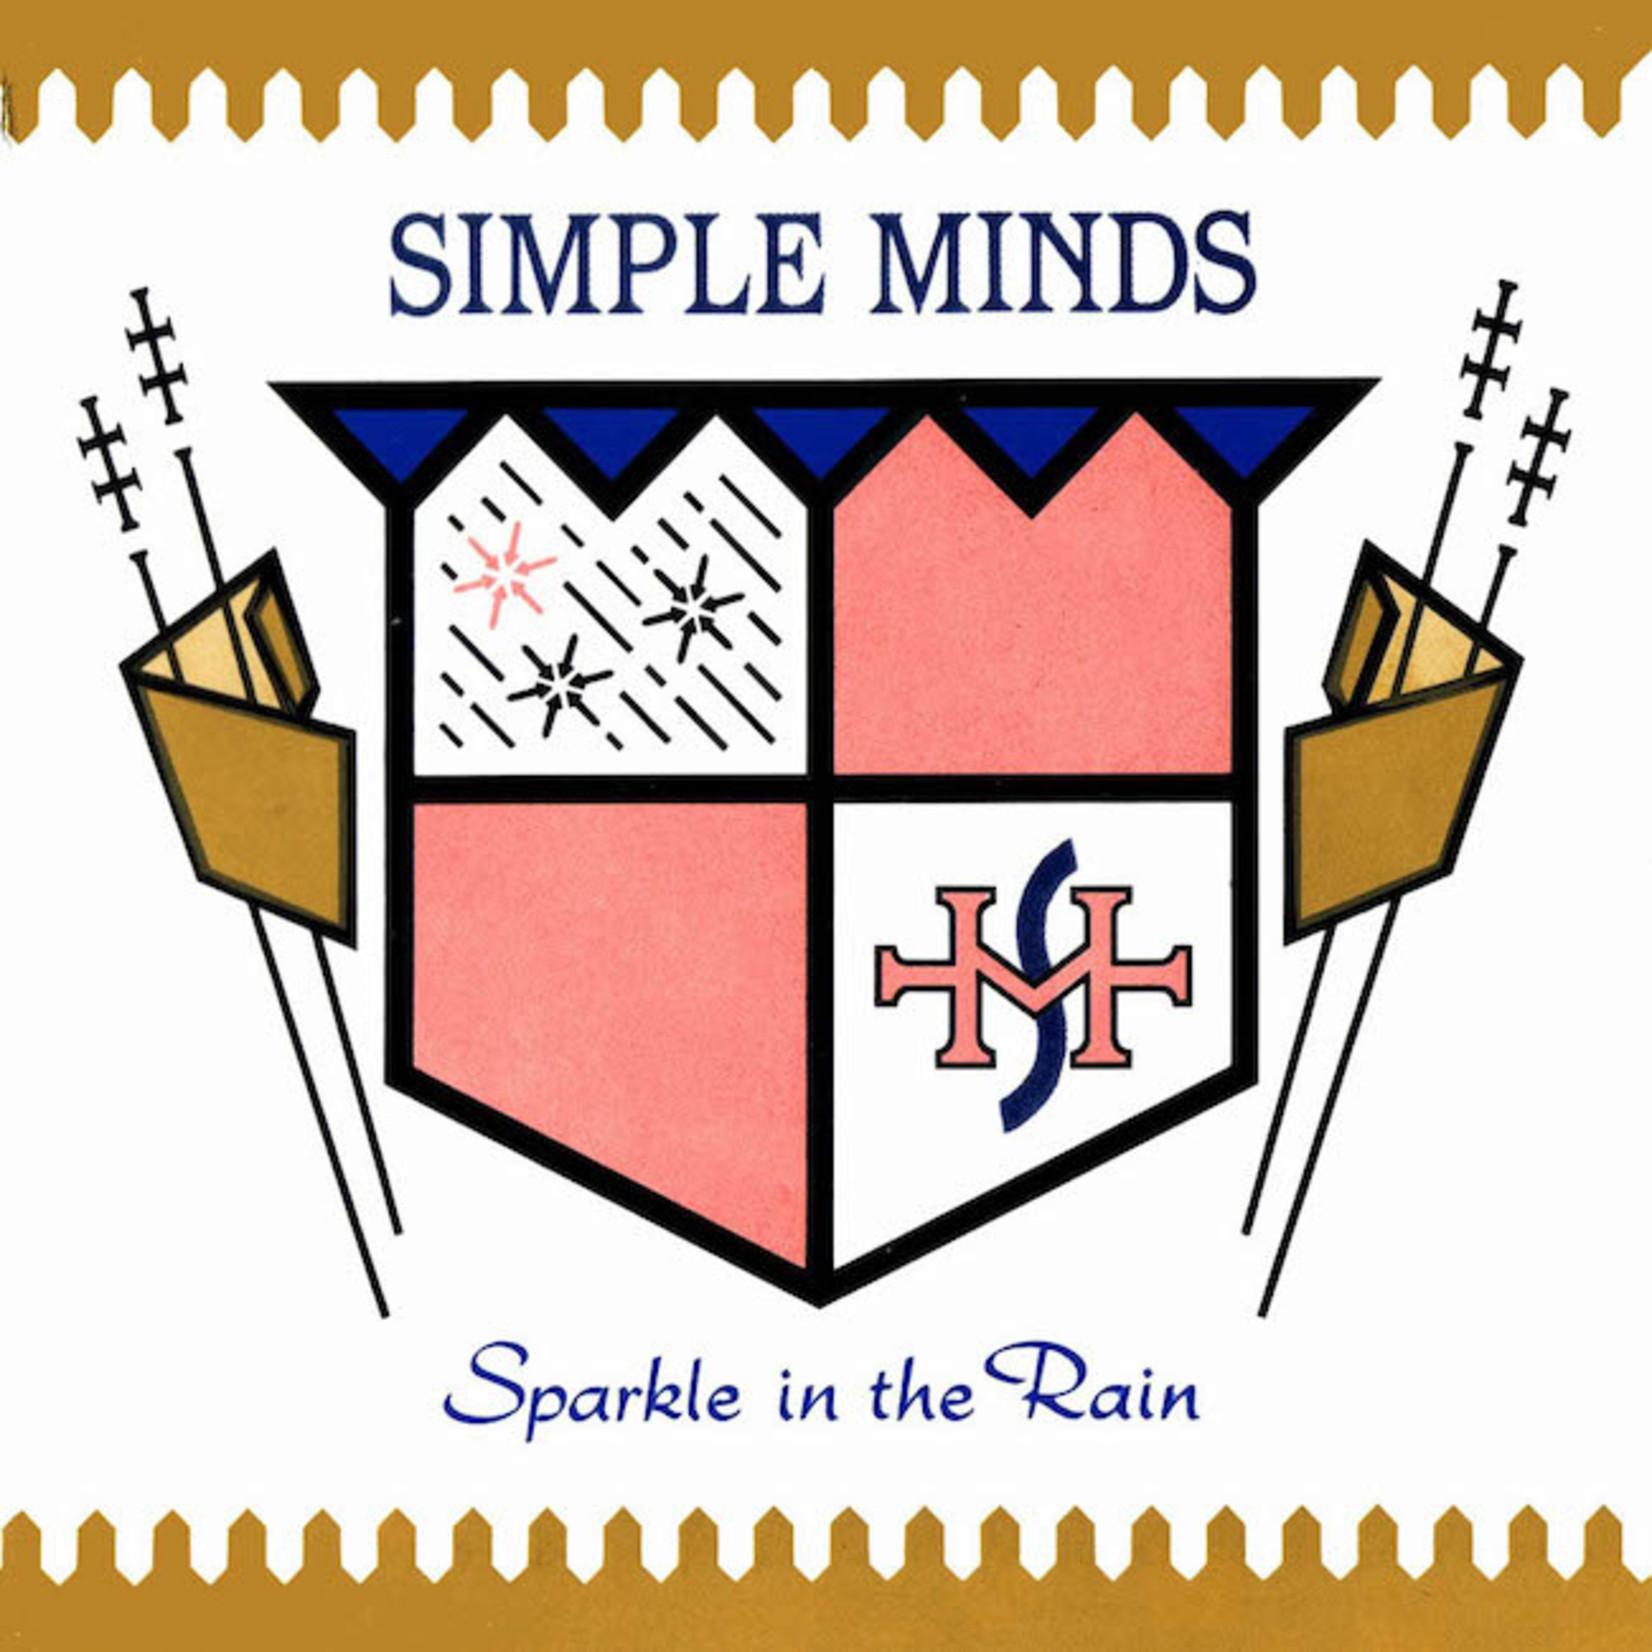 [Vintage] Simple Minds: Sparkle in the Rain